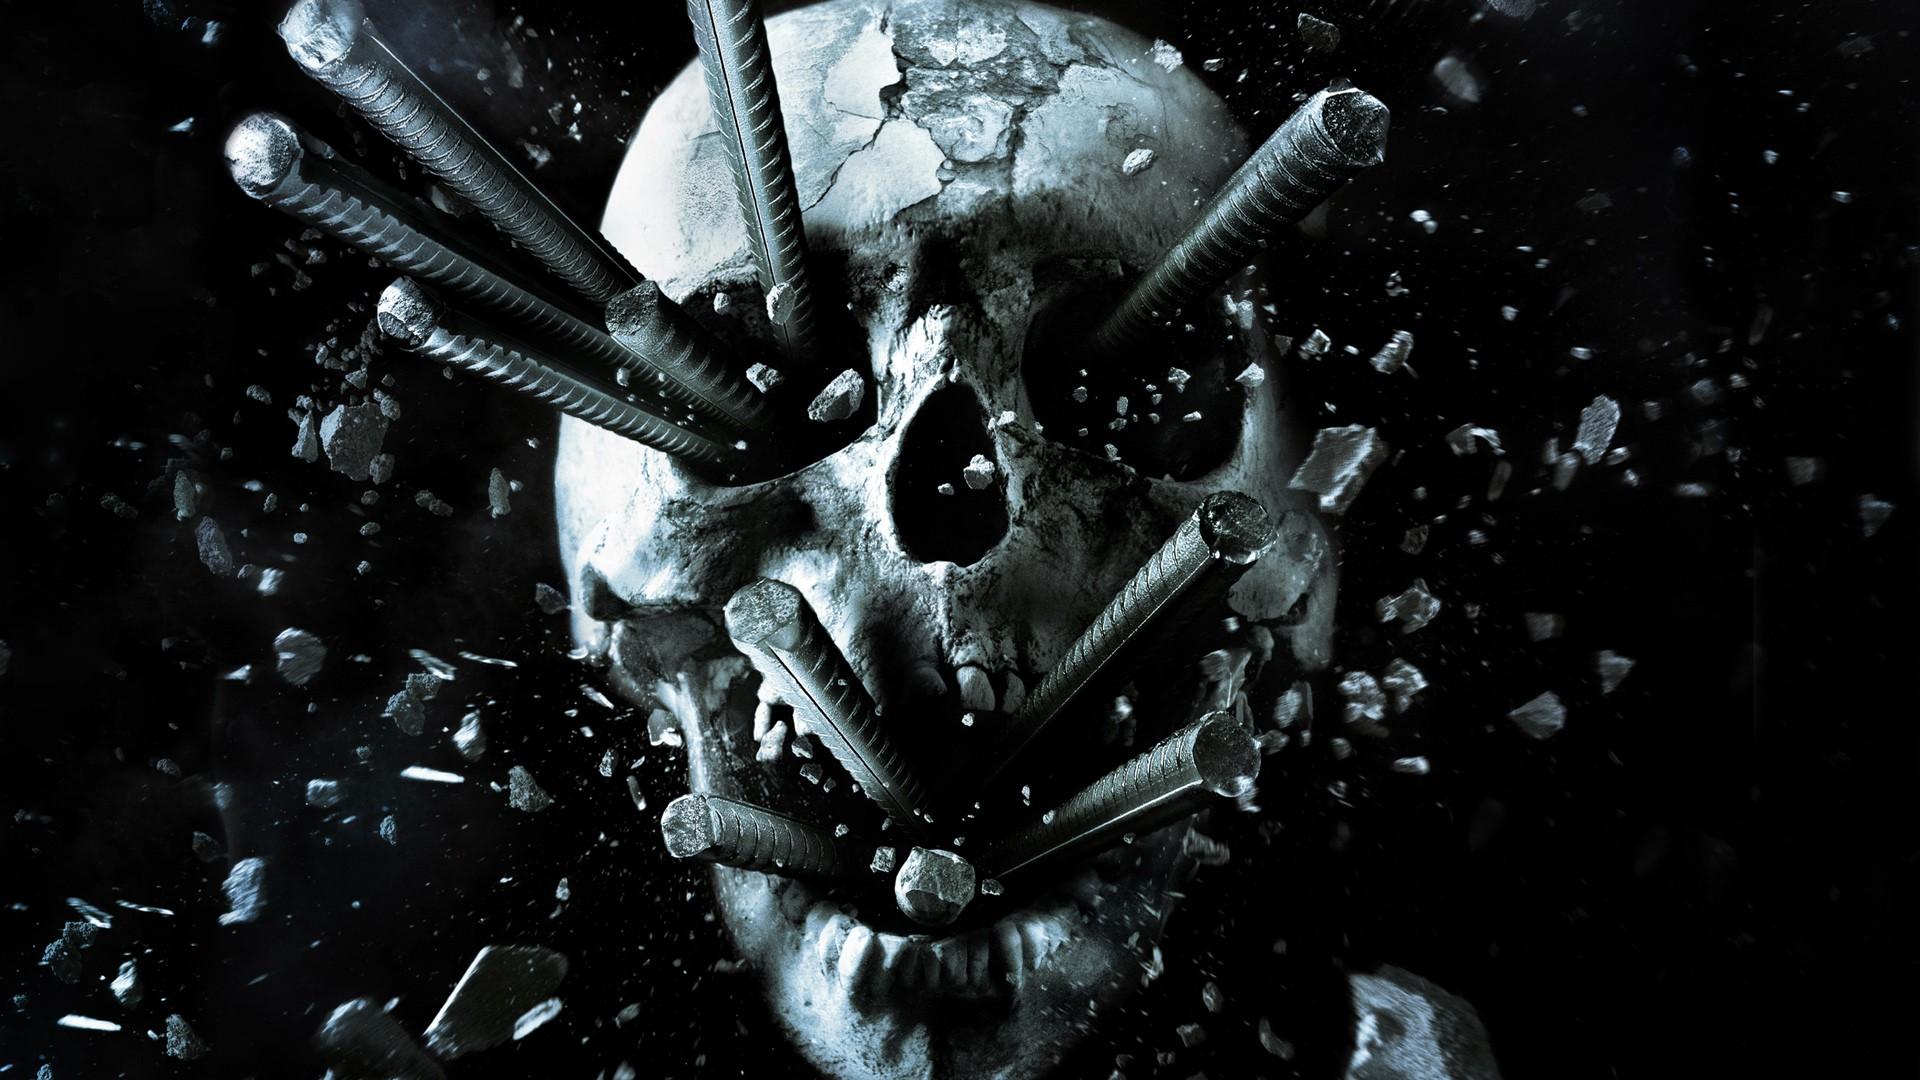 Digital Art Monochrome Black Background Dark Movies Metal Skull Broken Shrapnel Final Destination Darkness Screenshot Computer